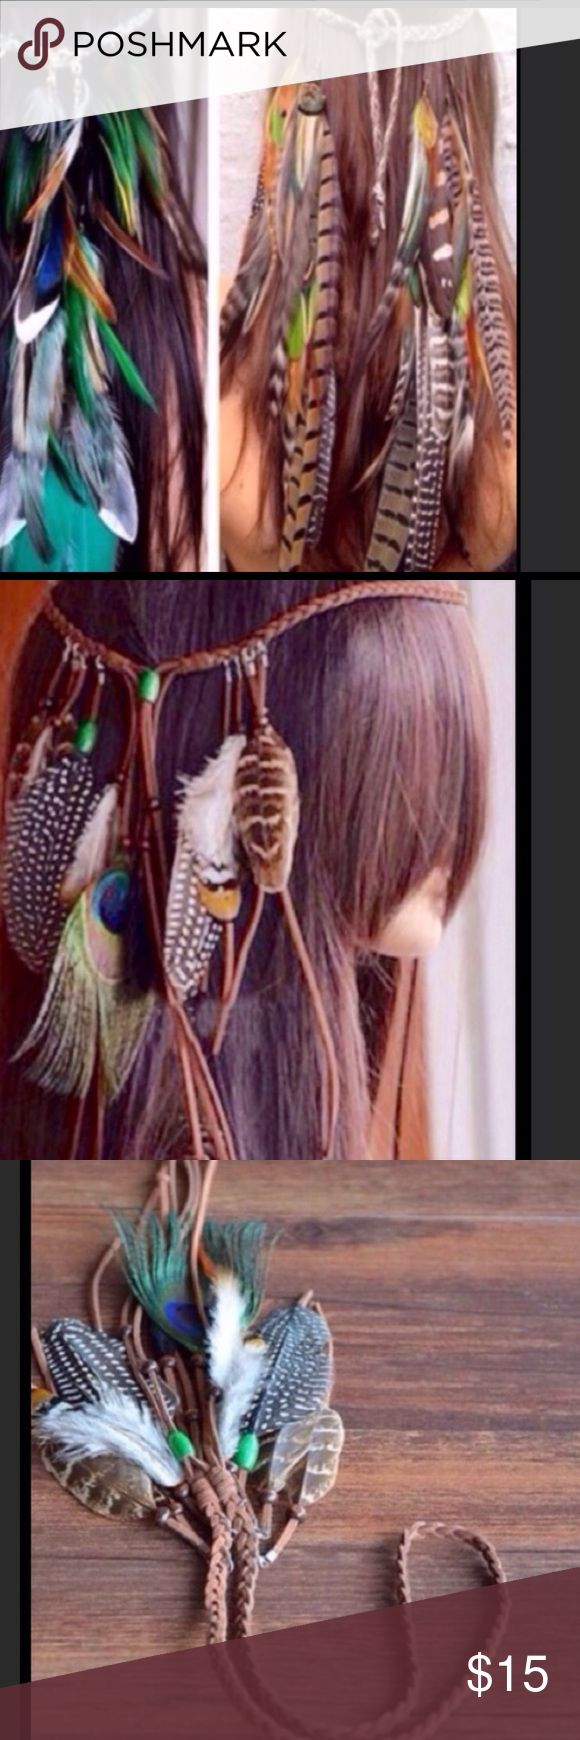 Fashion Indian feathers headband👲🏾👲🏾👲🏾👲🏾 Handmade Indian headband Brand New handmade Accessories Hair Accessories